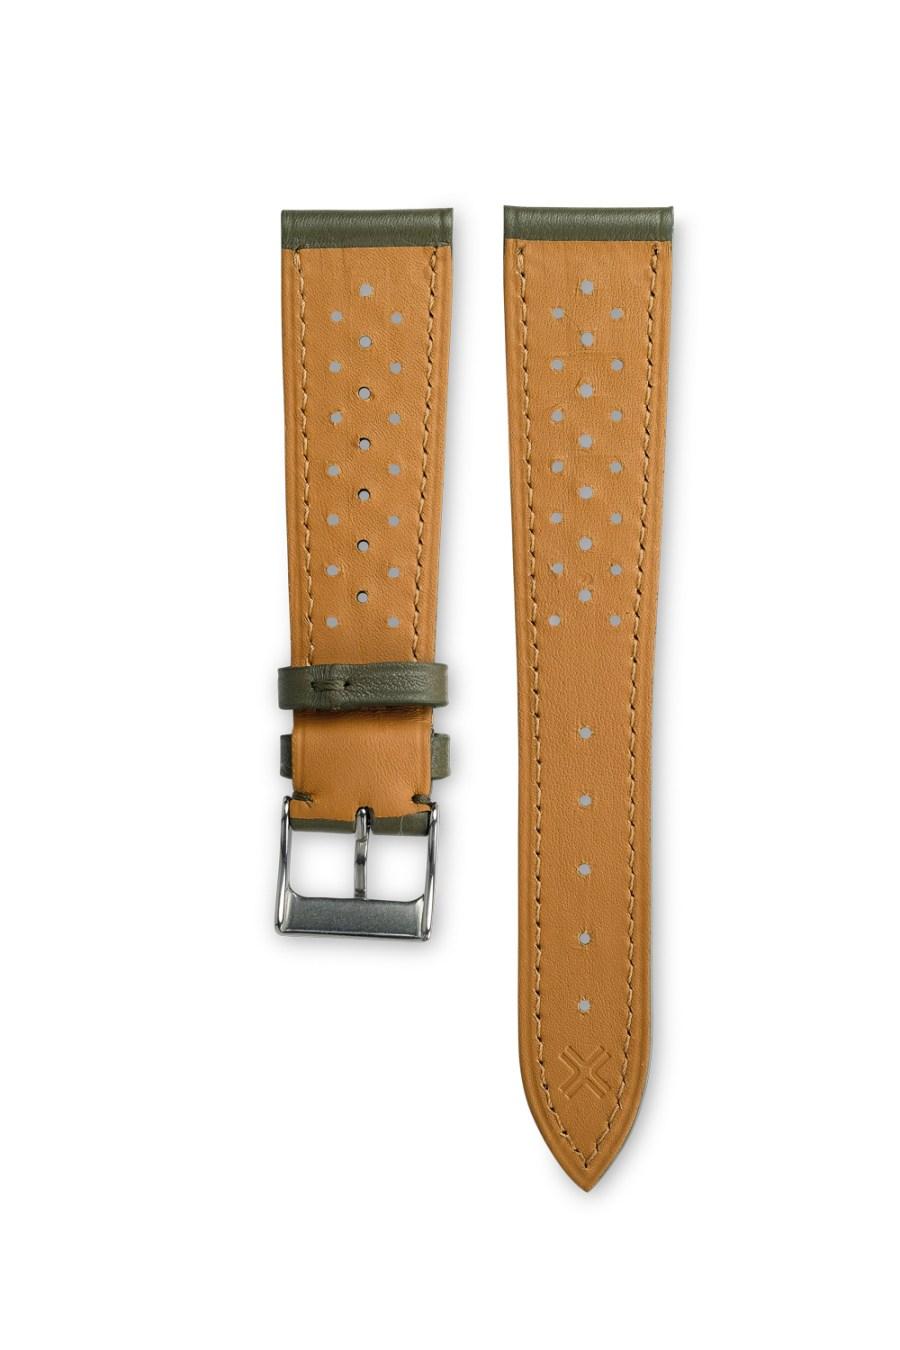 Smooth Racing khaki green leather watch strap - tone on tone stitching - LUGS brand